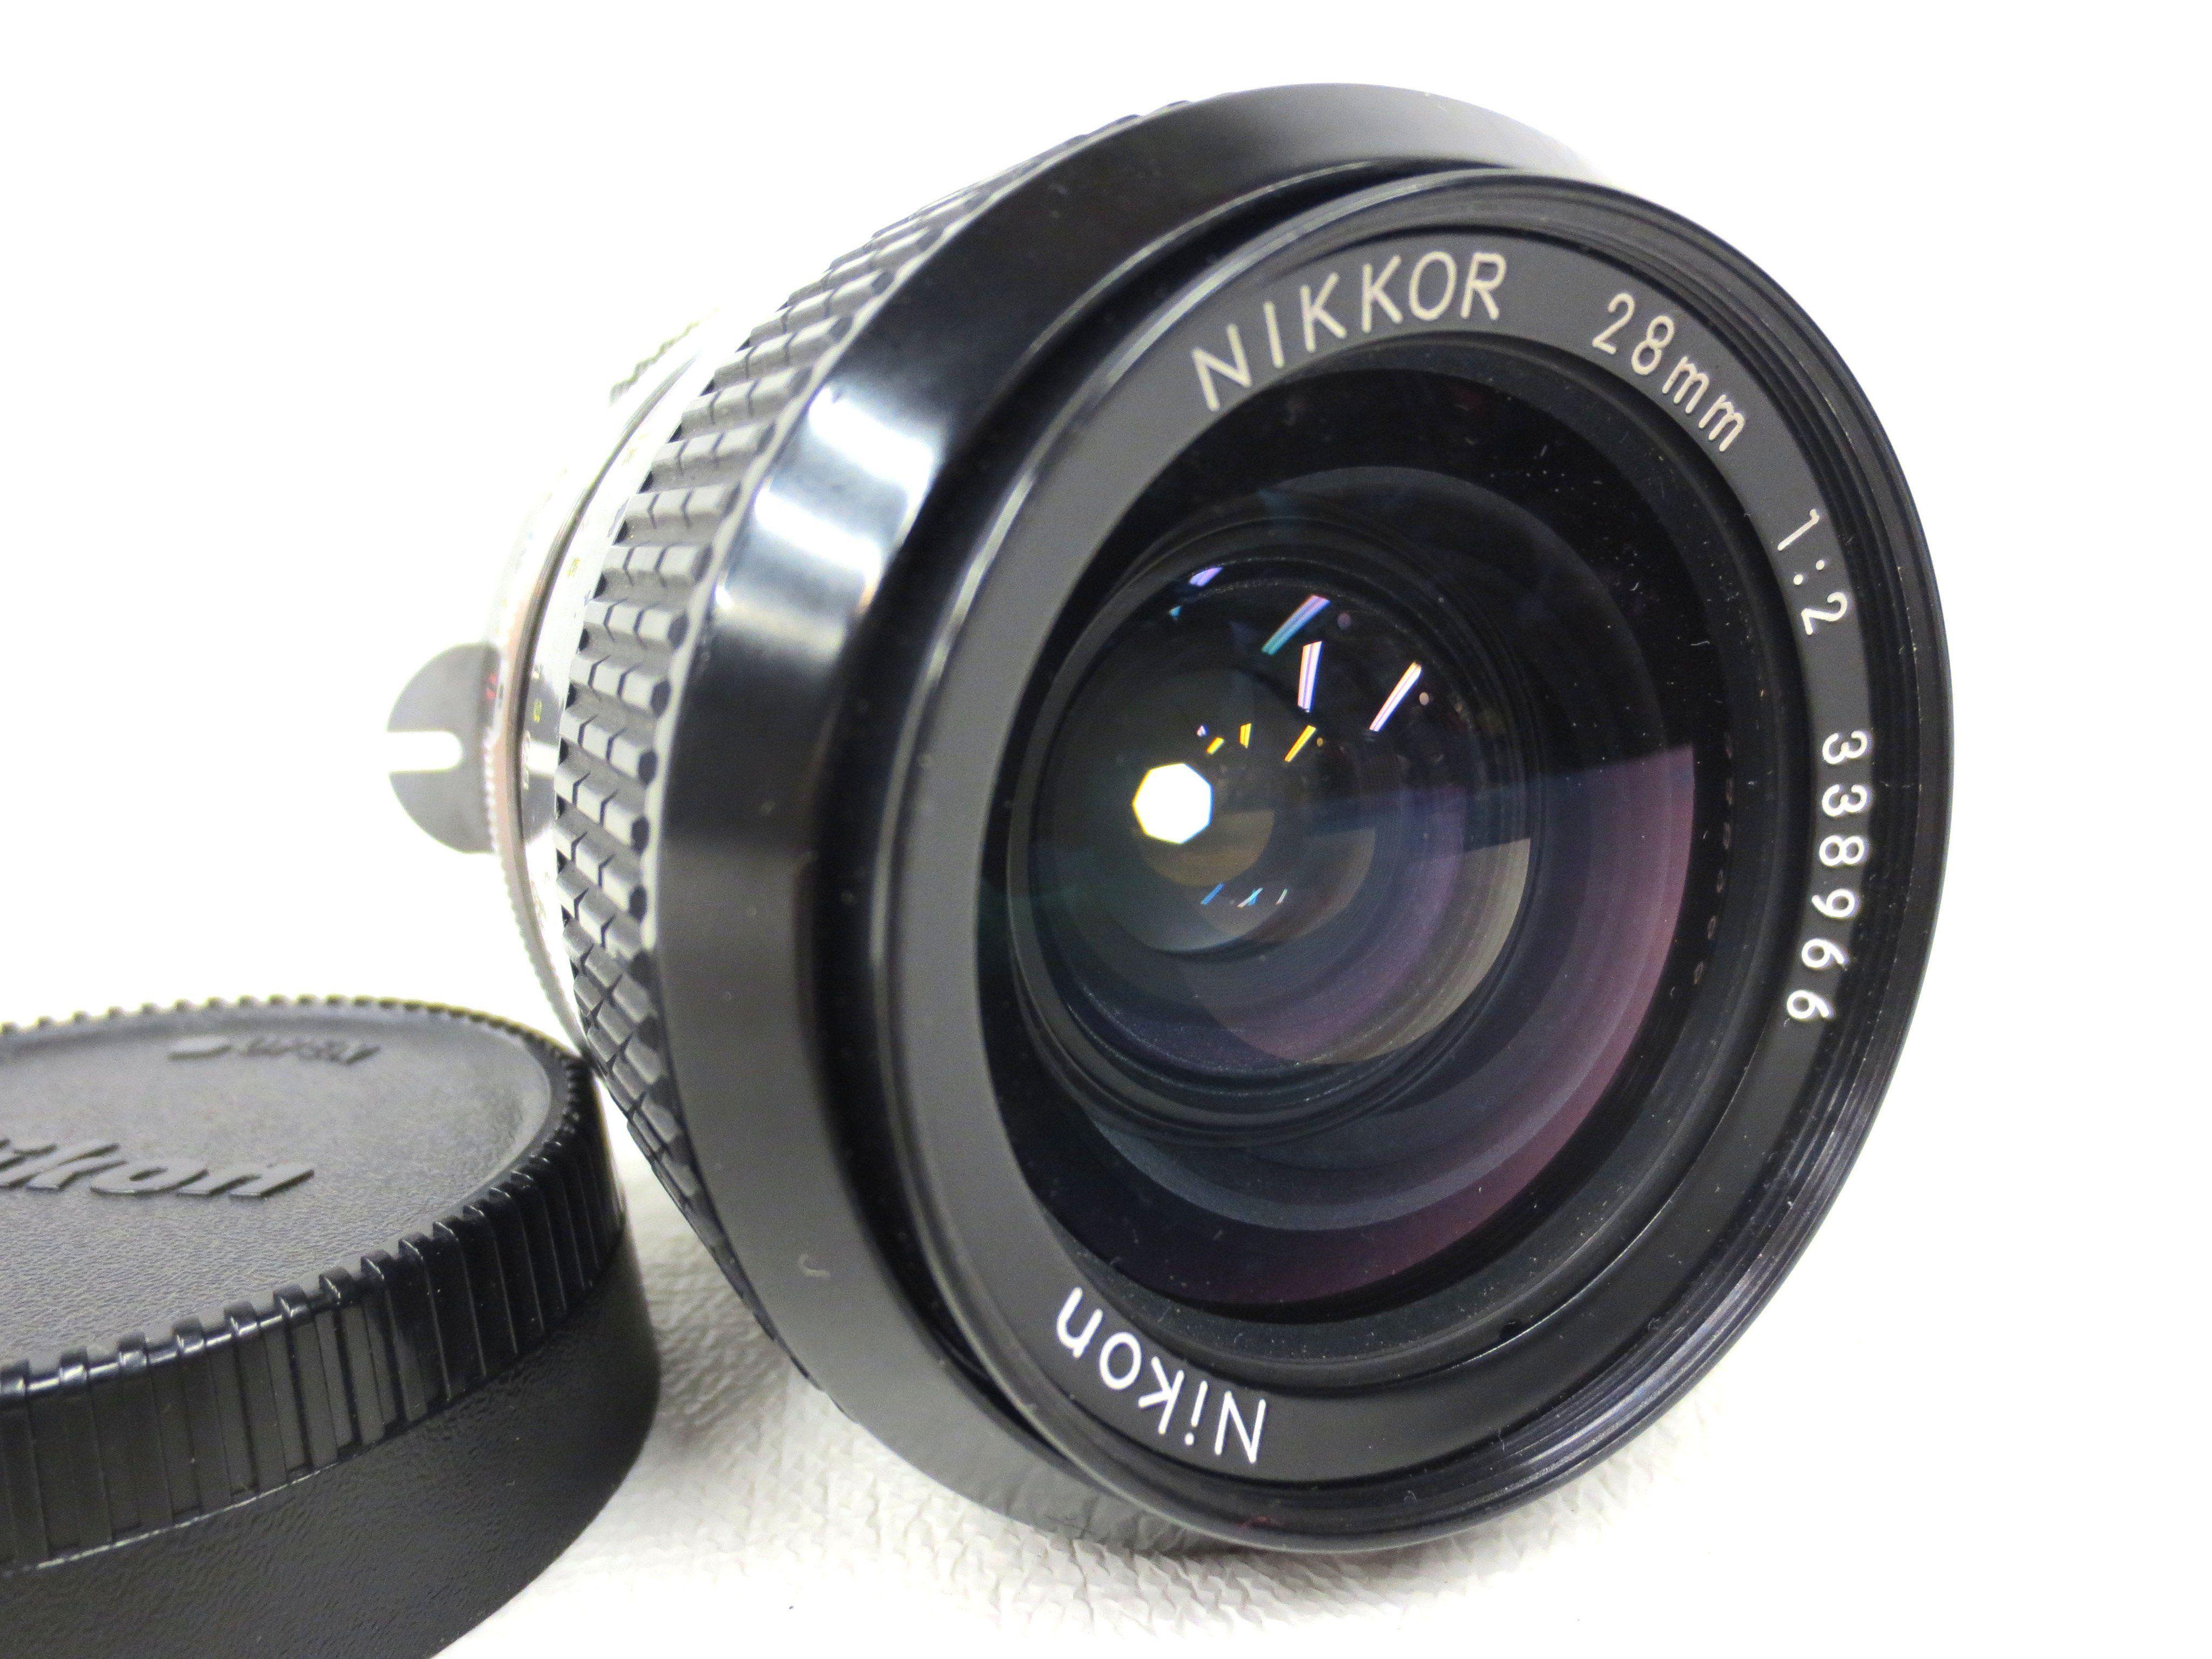 Vintage Nikon Nikkor 28mm 1 2 Manual Focus Camera Lens Zoom Number 338966 Focus Camera Camera Lens Vintage Cameras